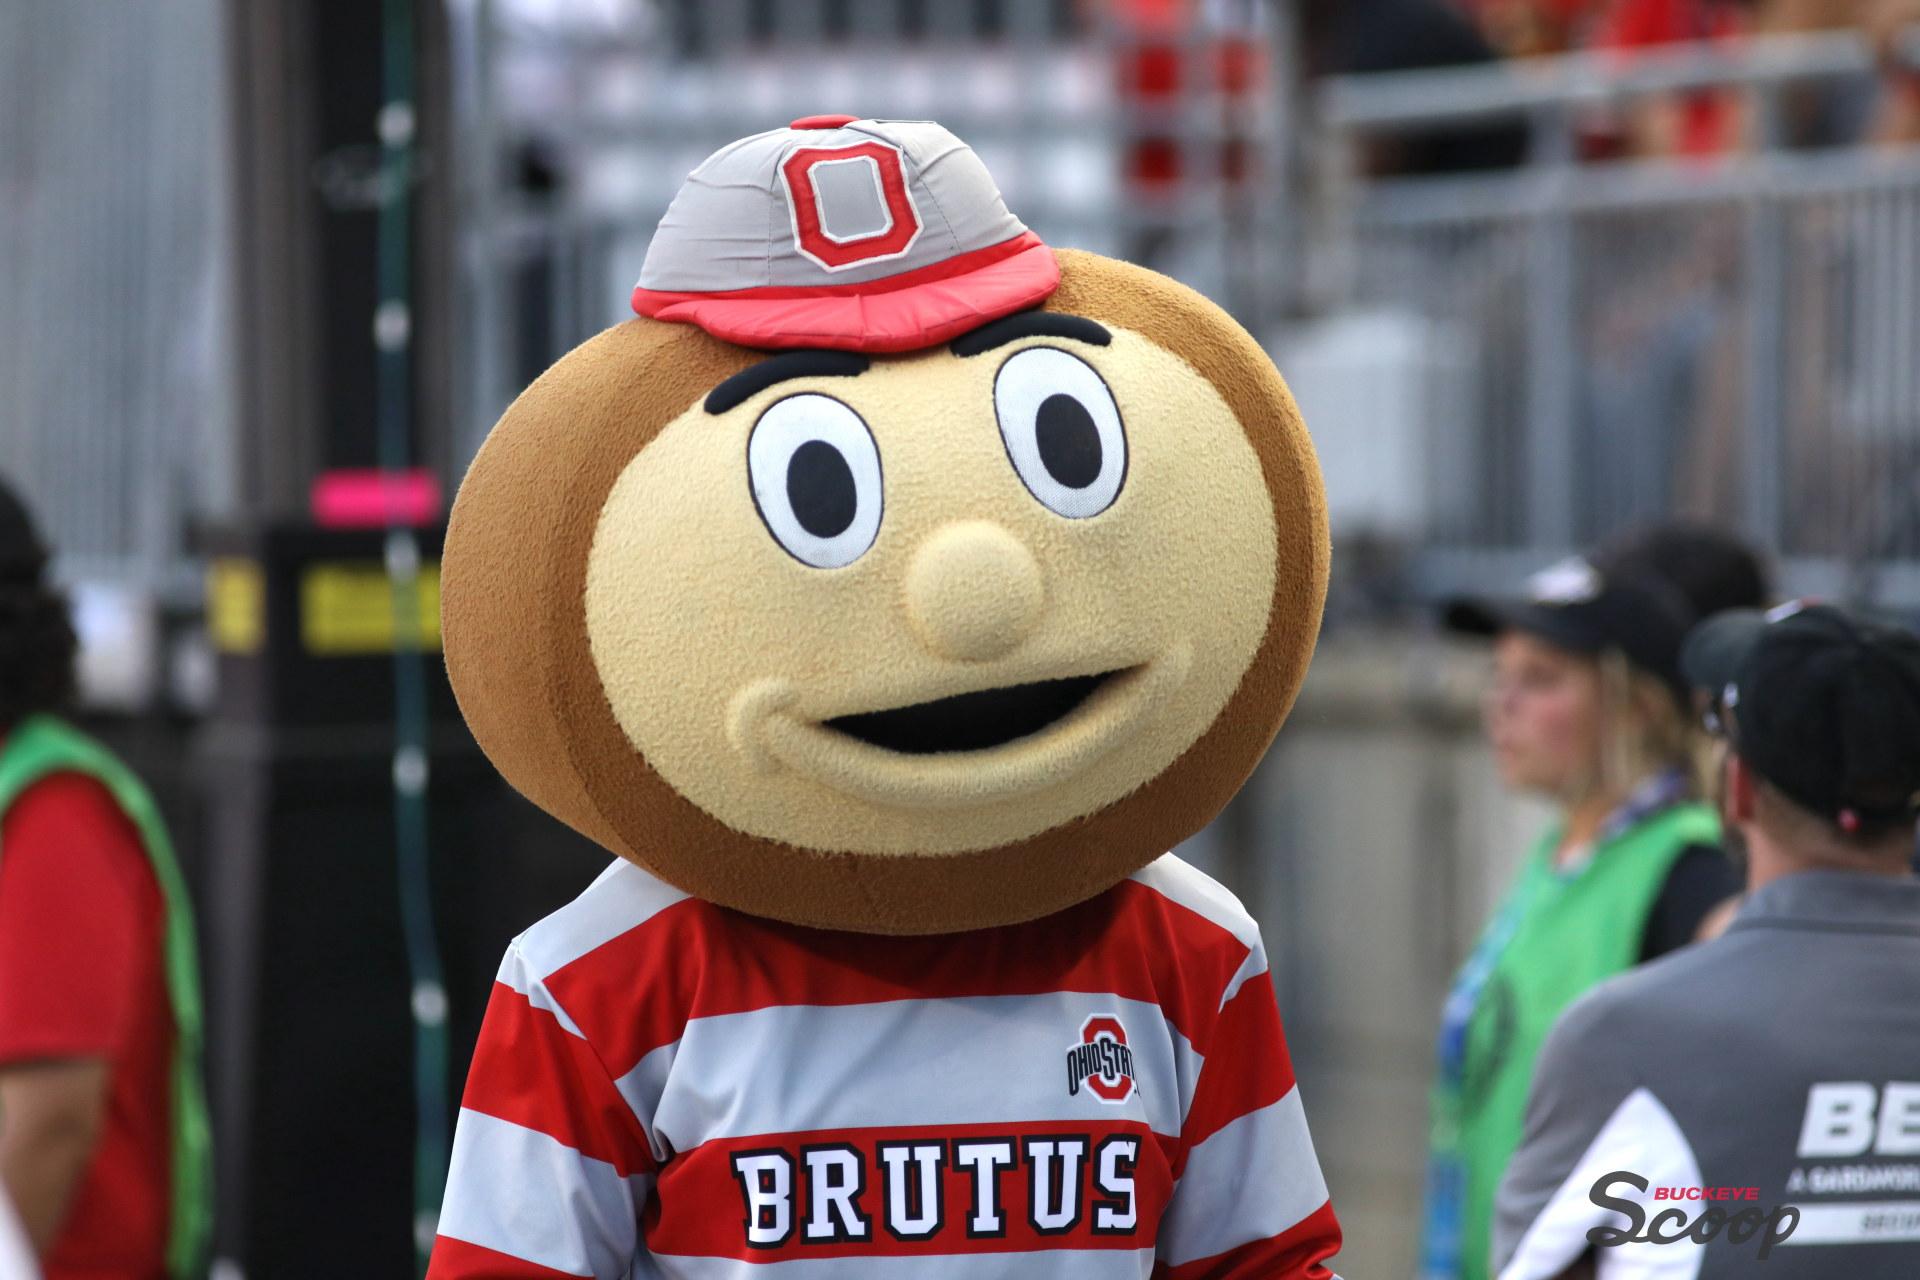 Ohio State football Brutus Buckeye